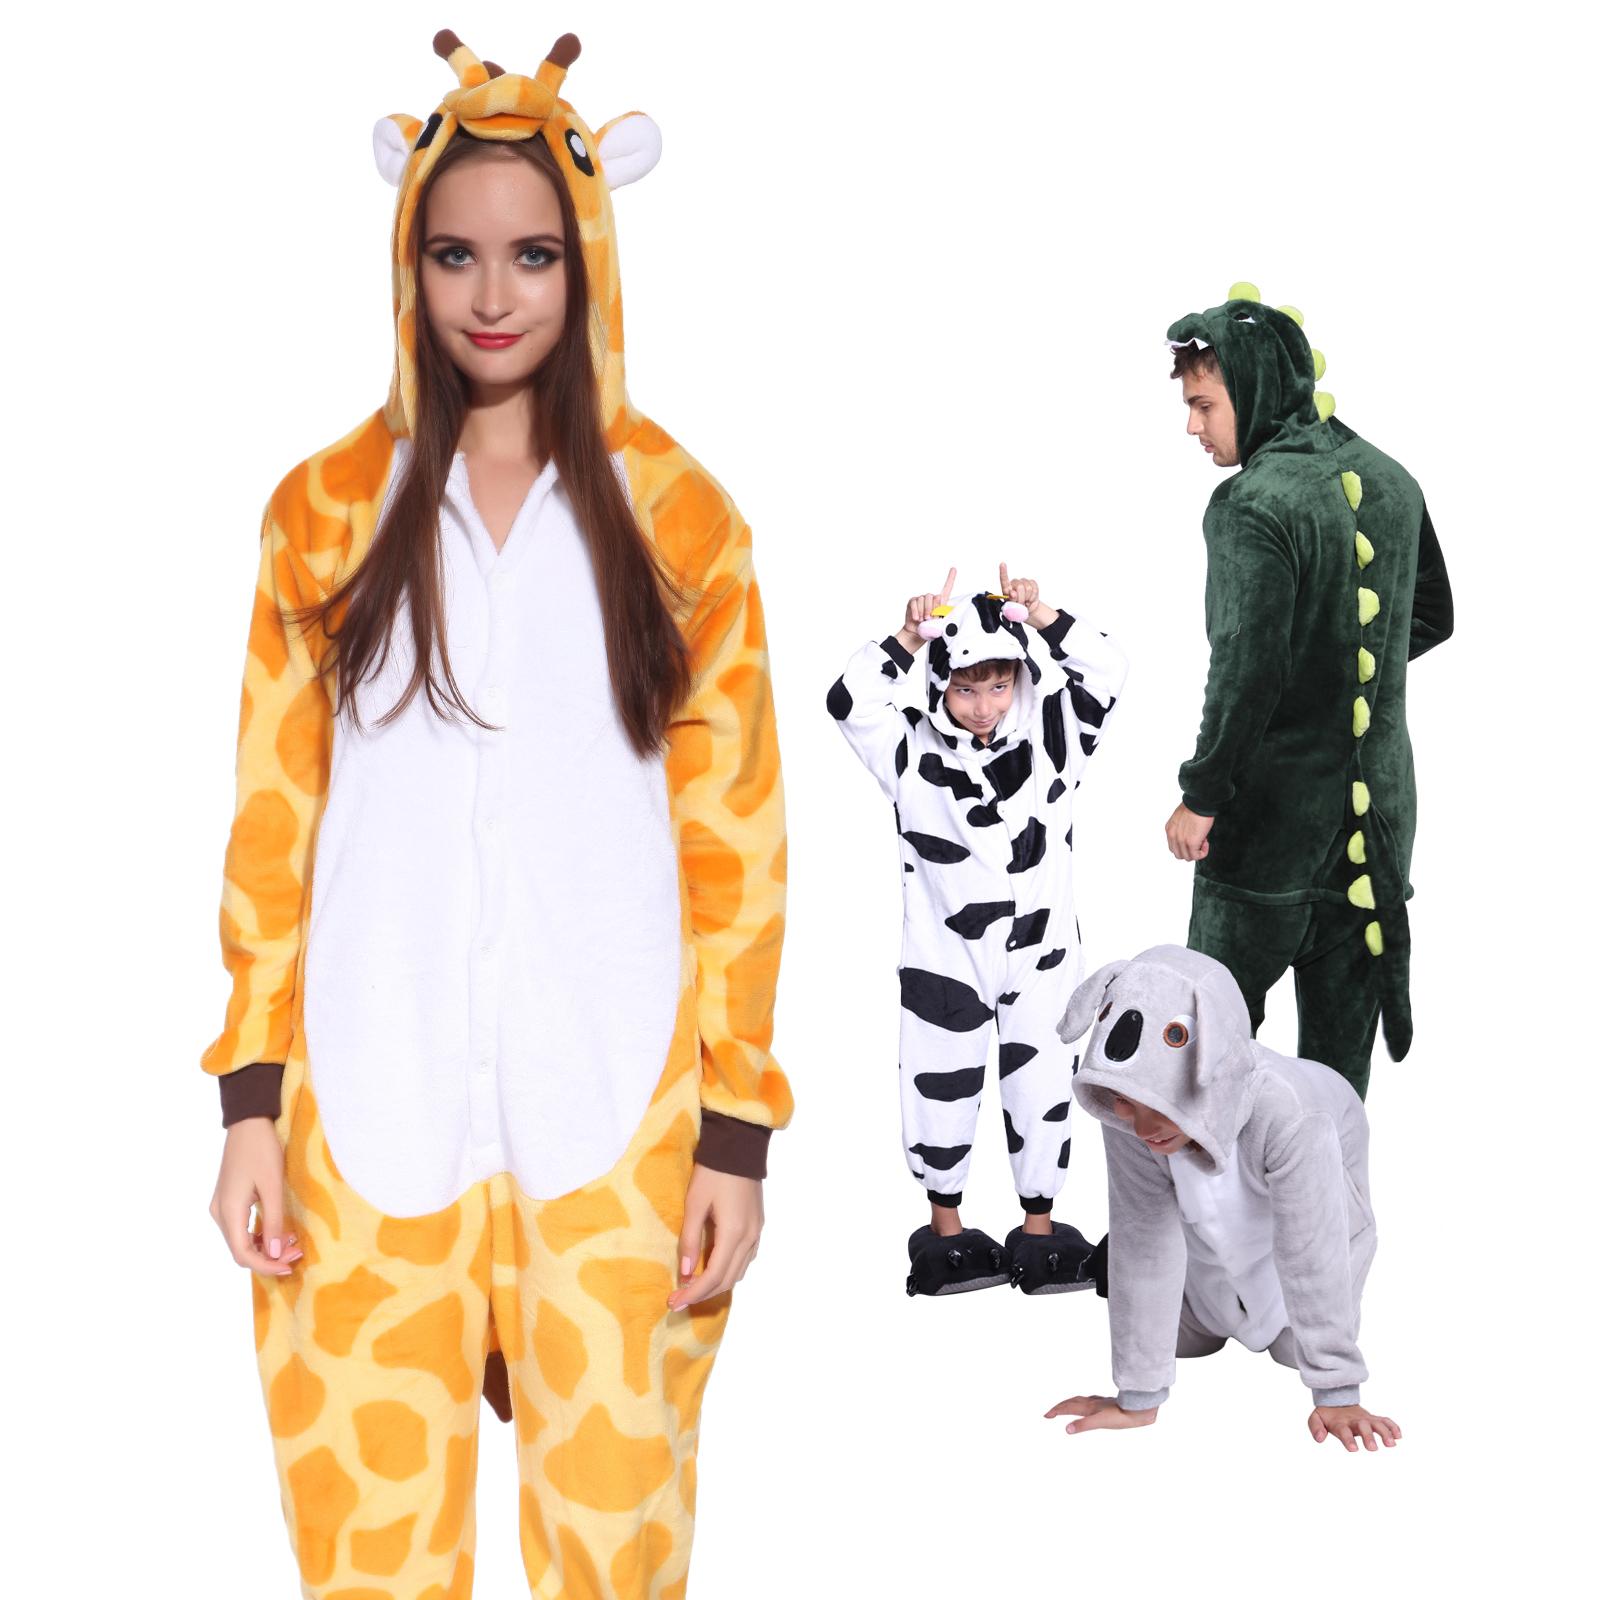 faschingkost m schlafanzug tier kost me karneval giraffe. Black Bedroom Furniture Sets. Home Design Ideas